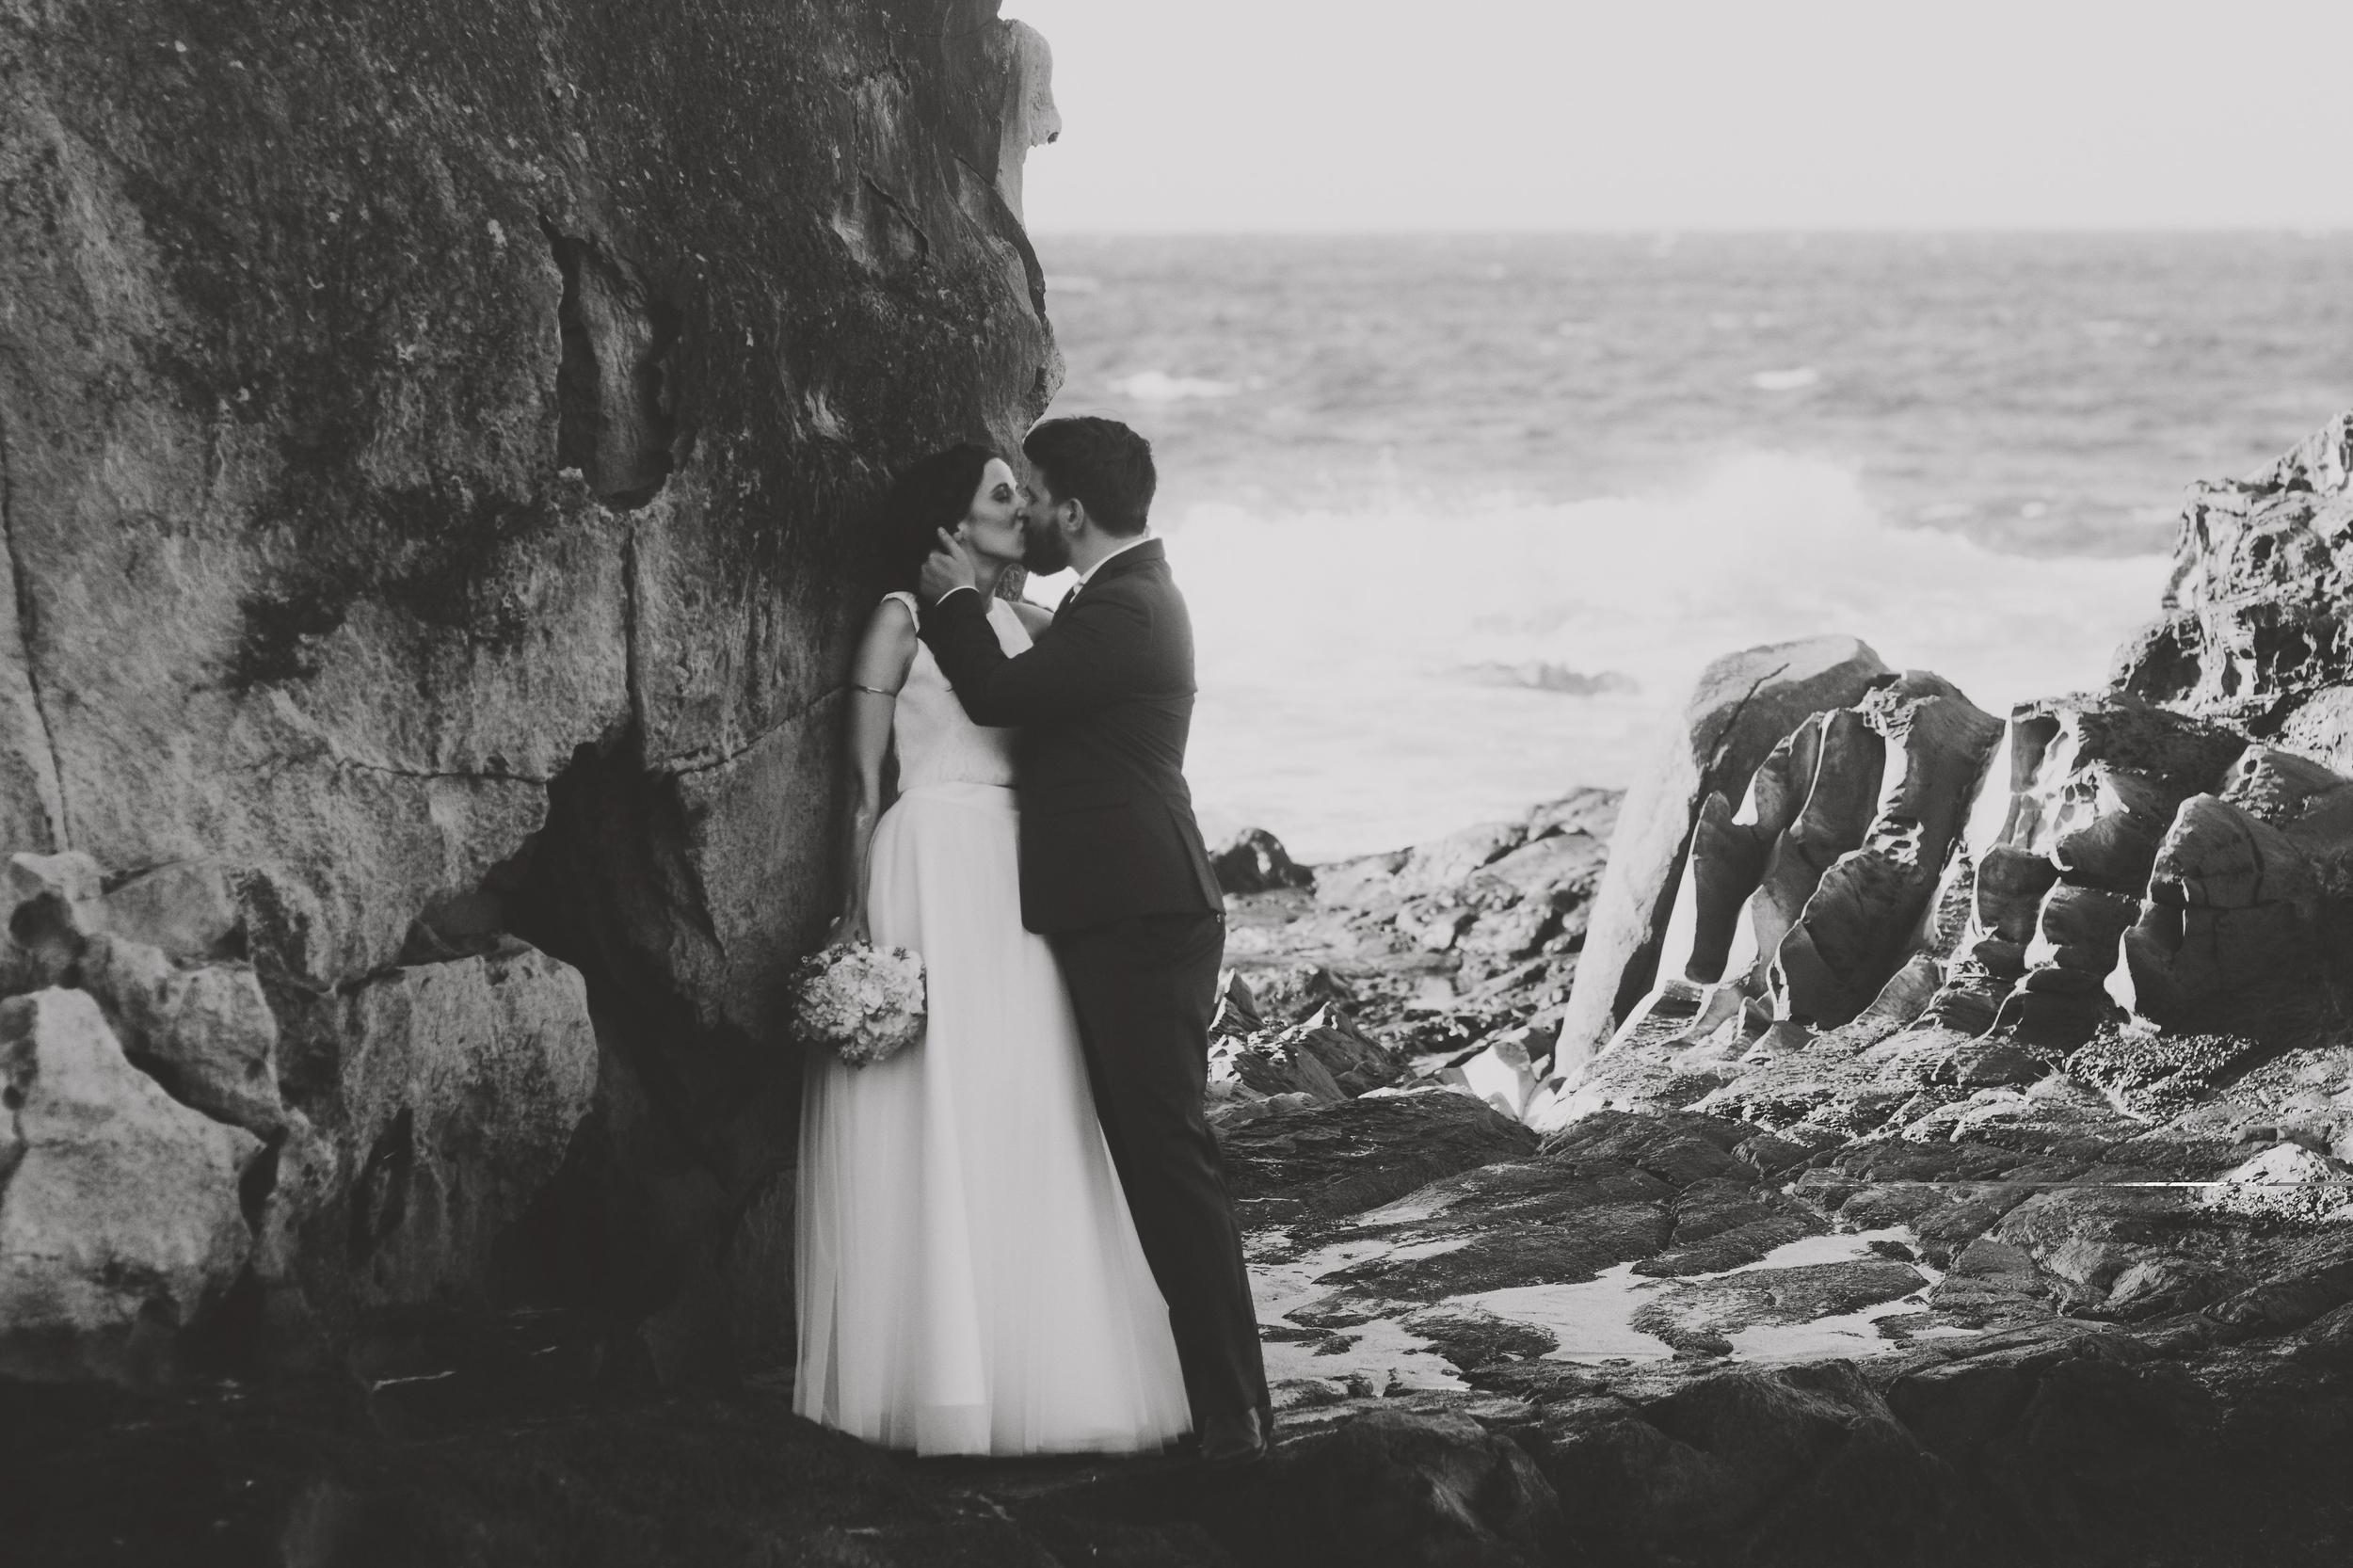 angie-diaz-photography-maui-wedding-ironwoods-beach-43.jpg